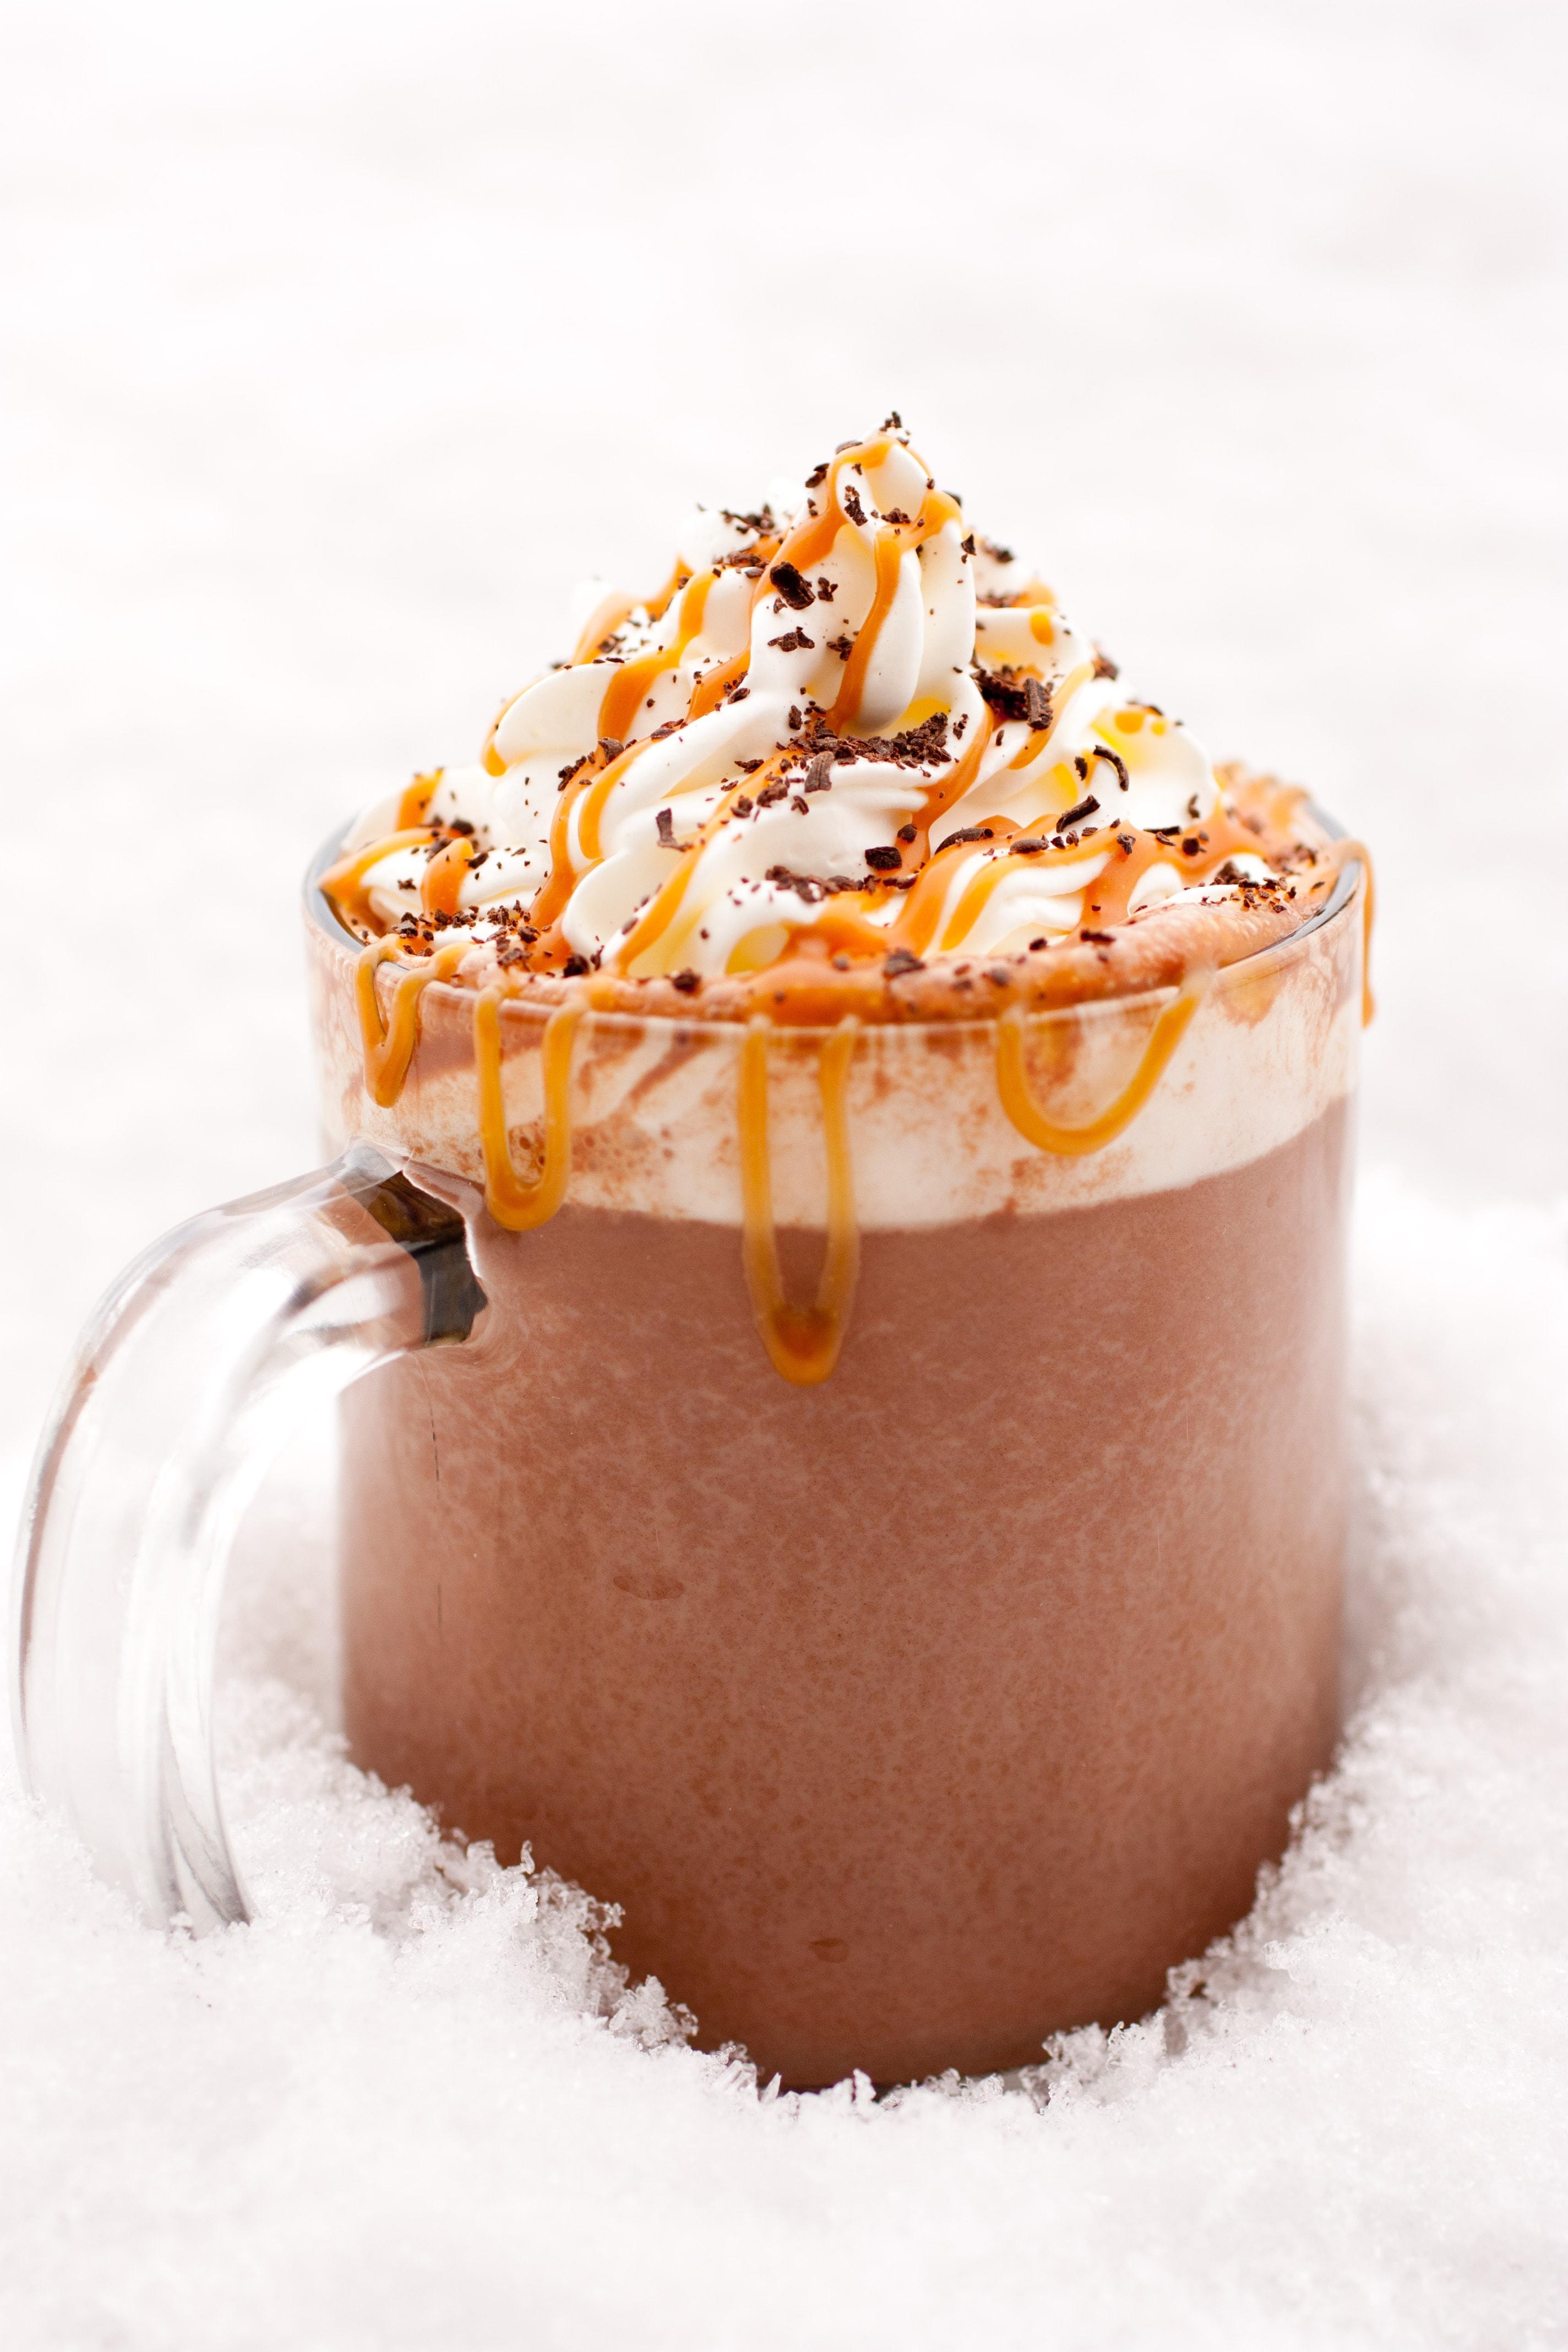 Caramel Hot Chocolate - Cooking Classy